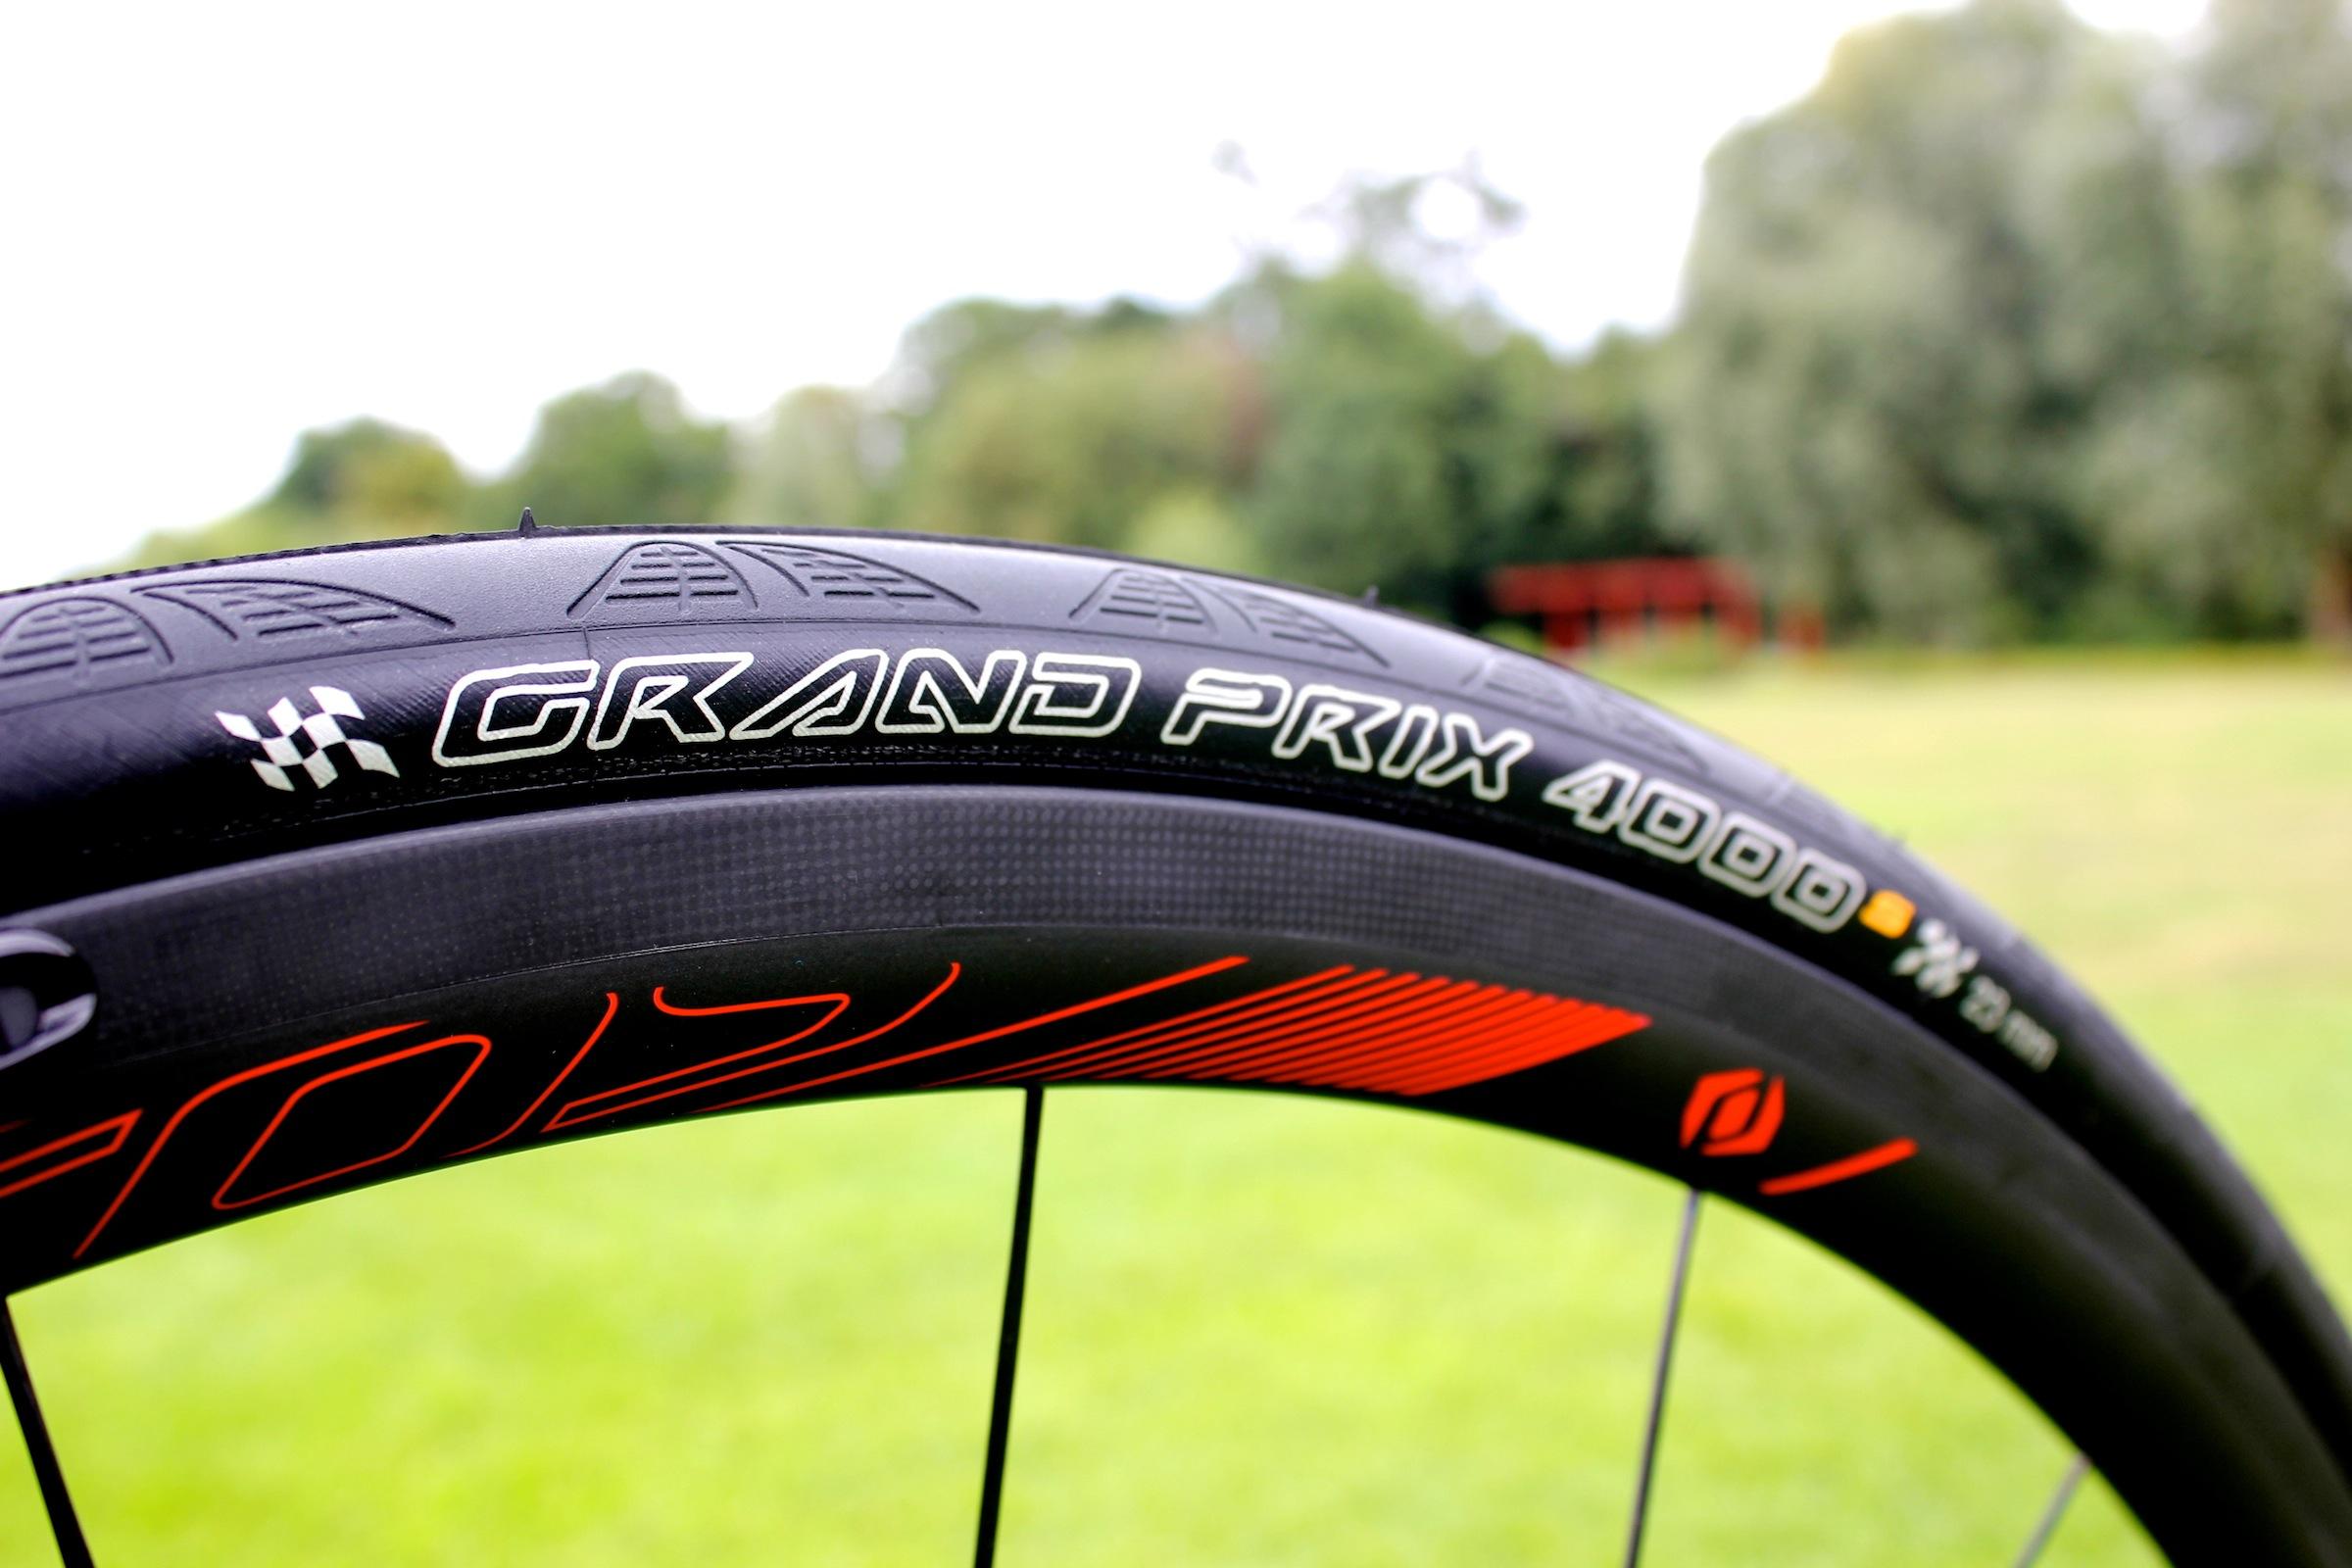 Scott Addict SL, Syncros wheels, pic: Timothy John, ©Factory Media